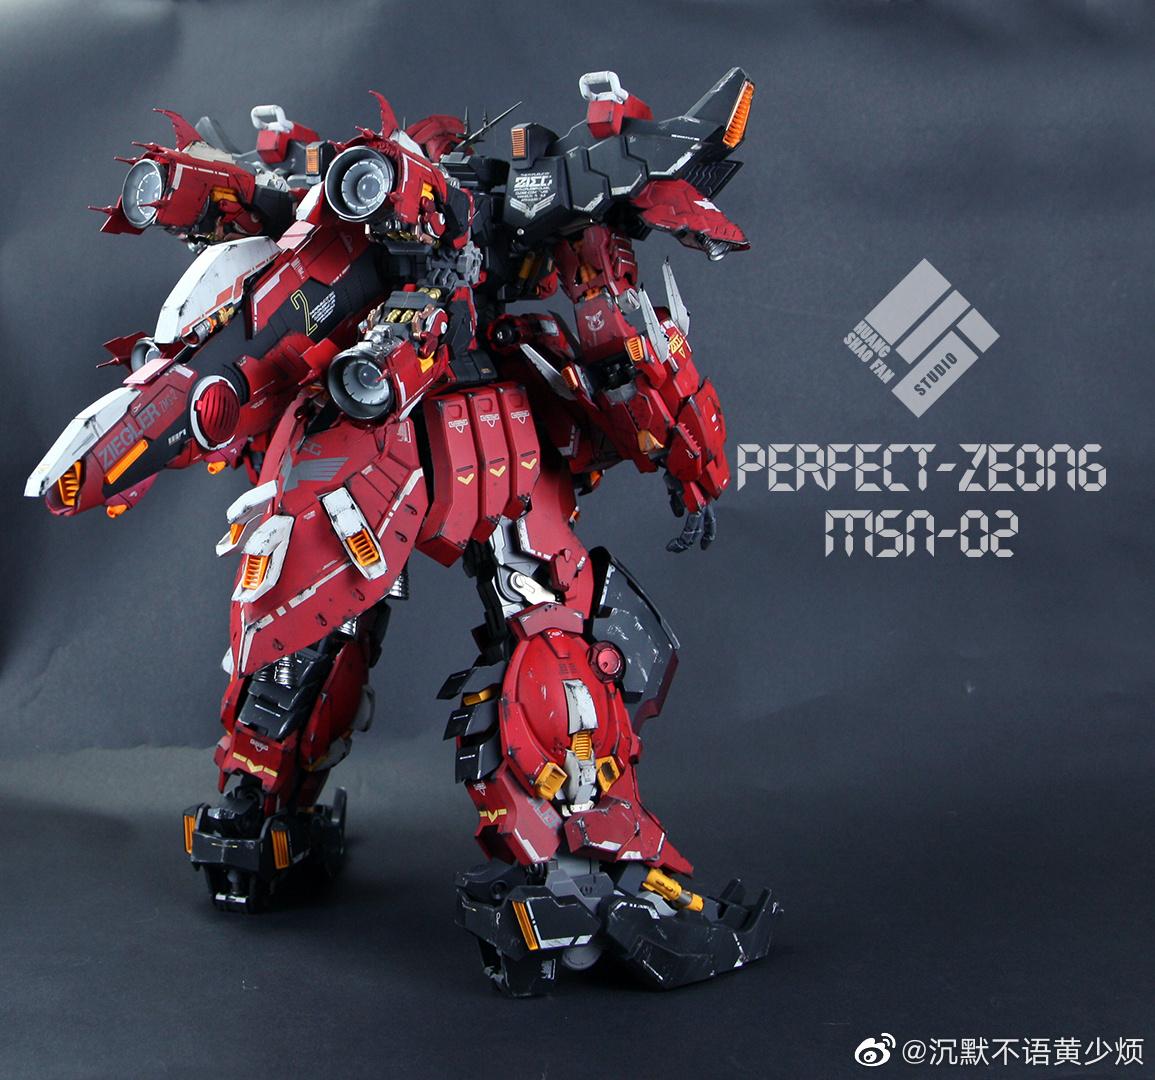 S164_2_mc_perfect_zeong_red_005.jpg